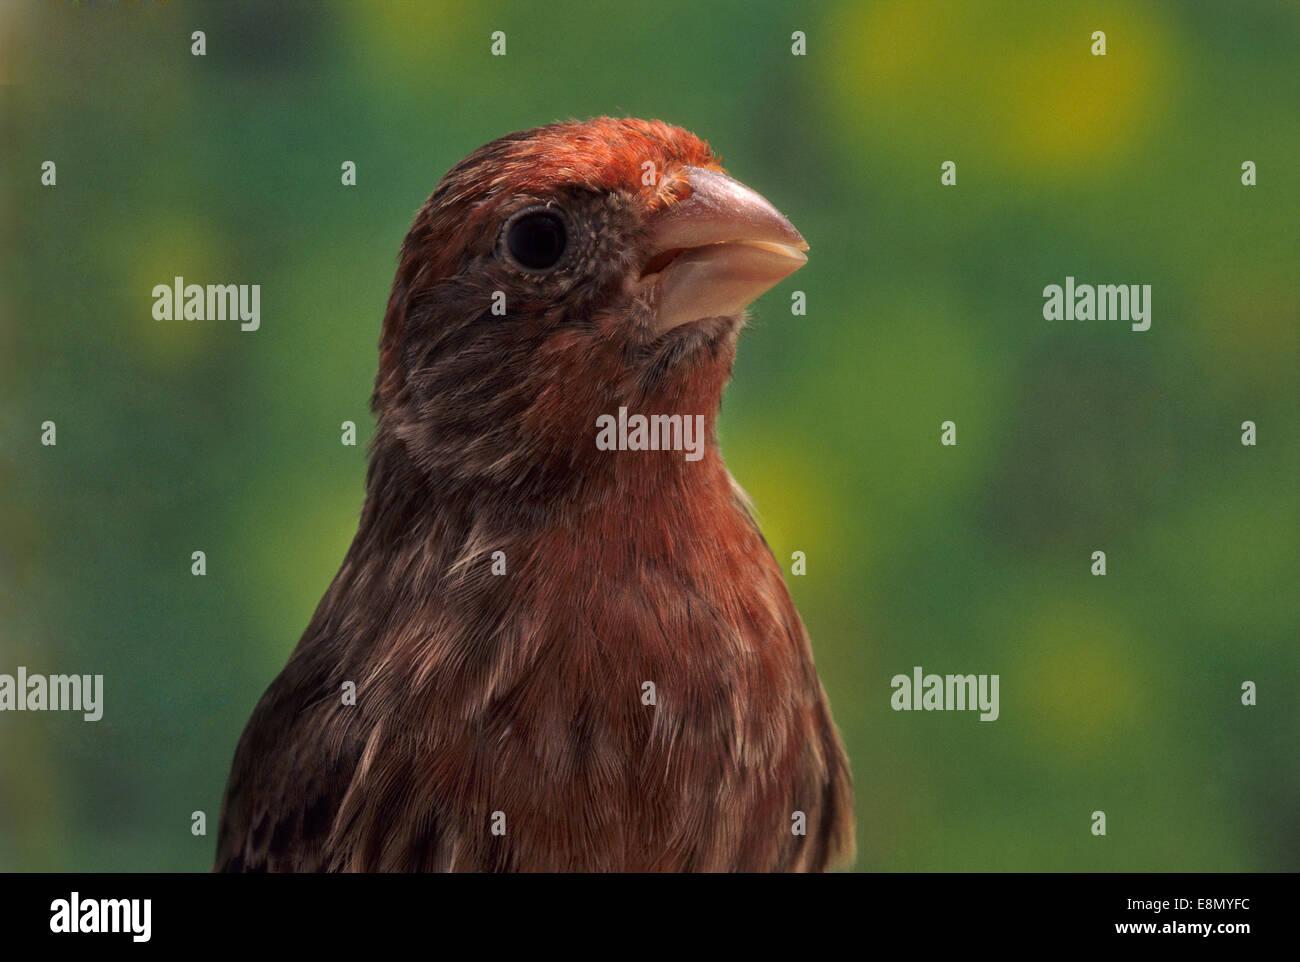 Island canary, Serinus canaria, Fringillidae, Canarie Islands - Stock Image